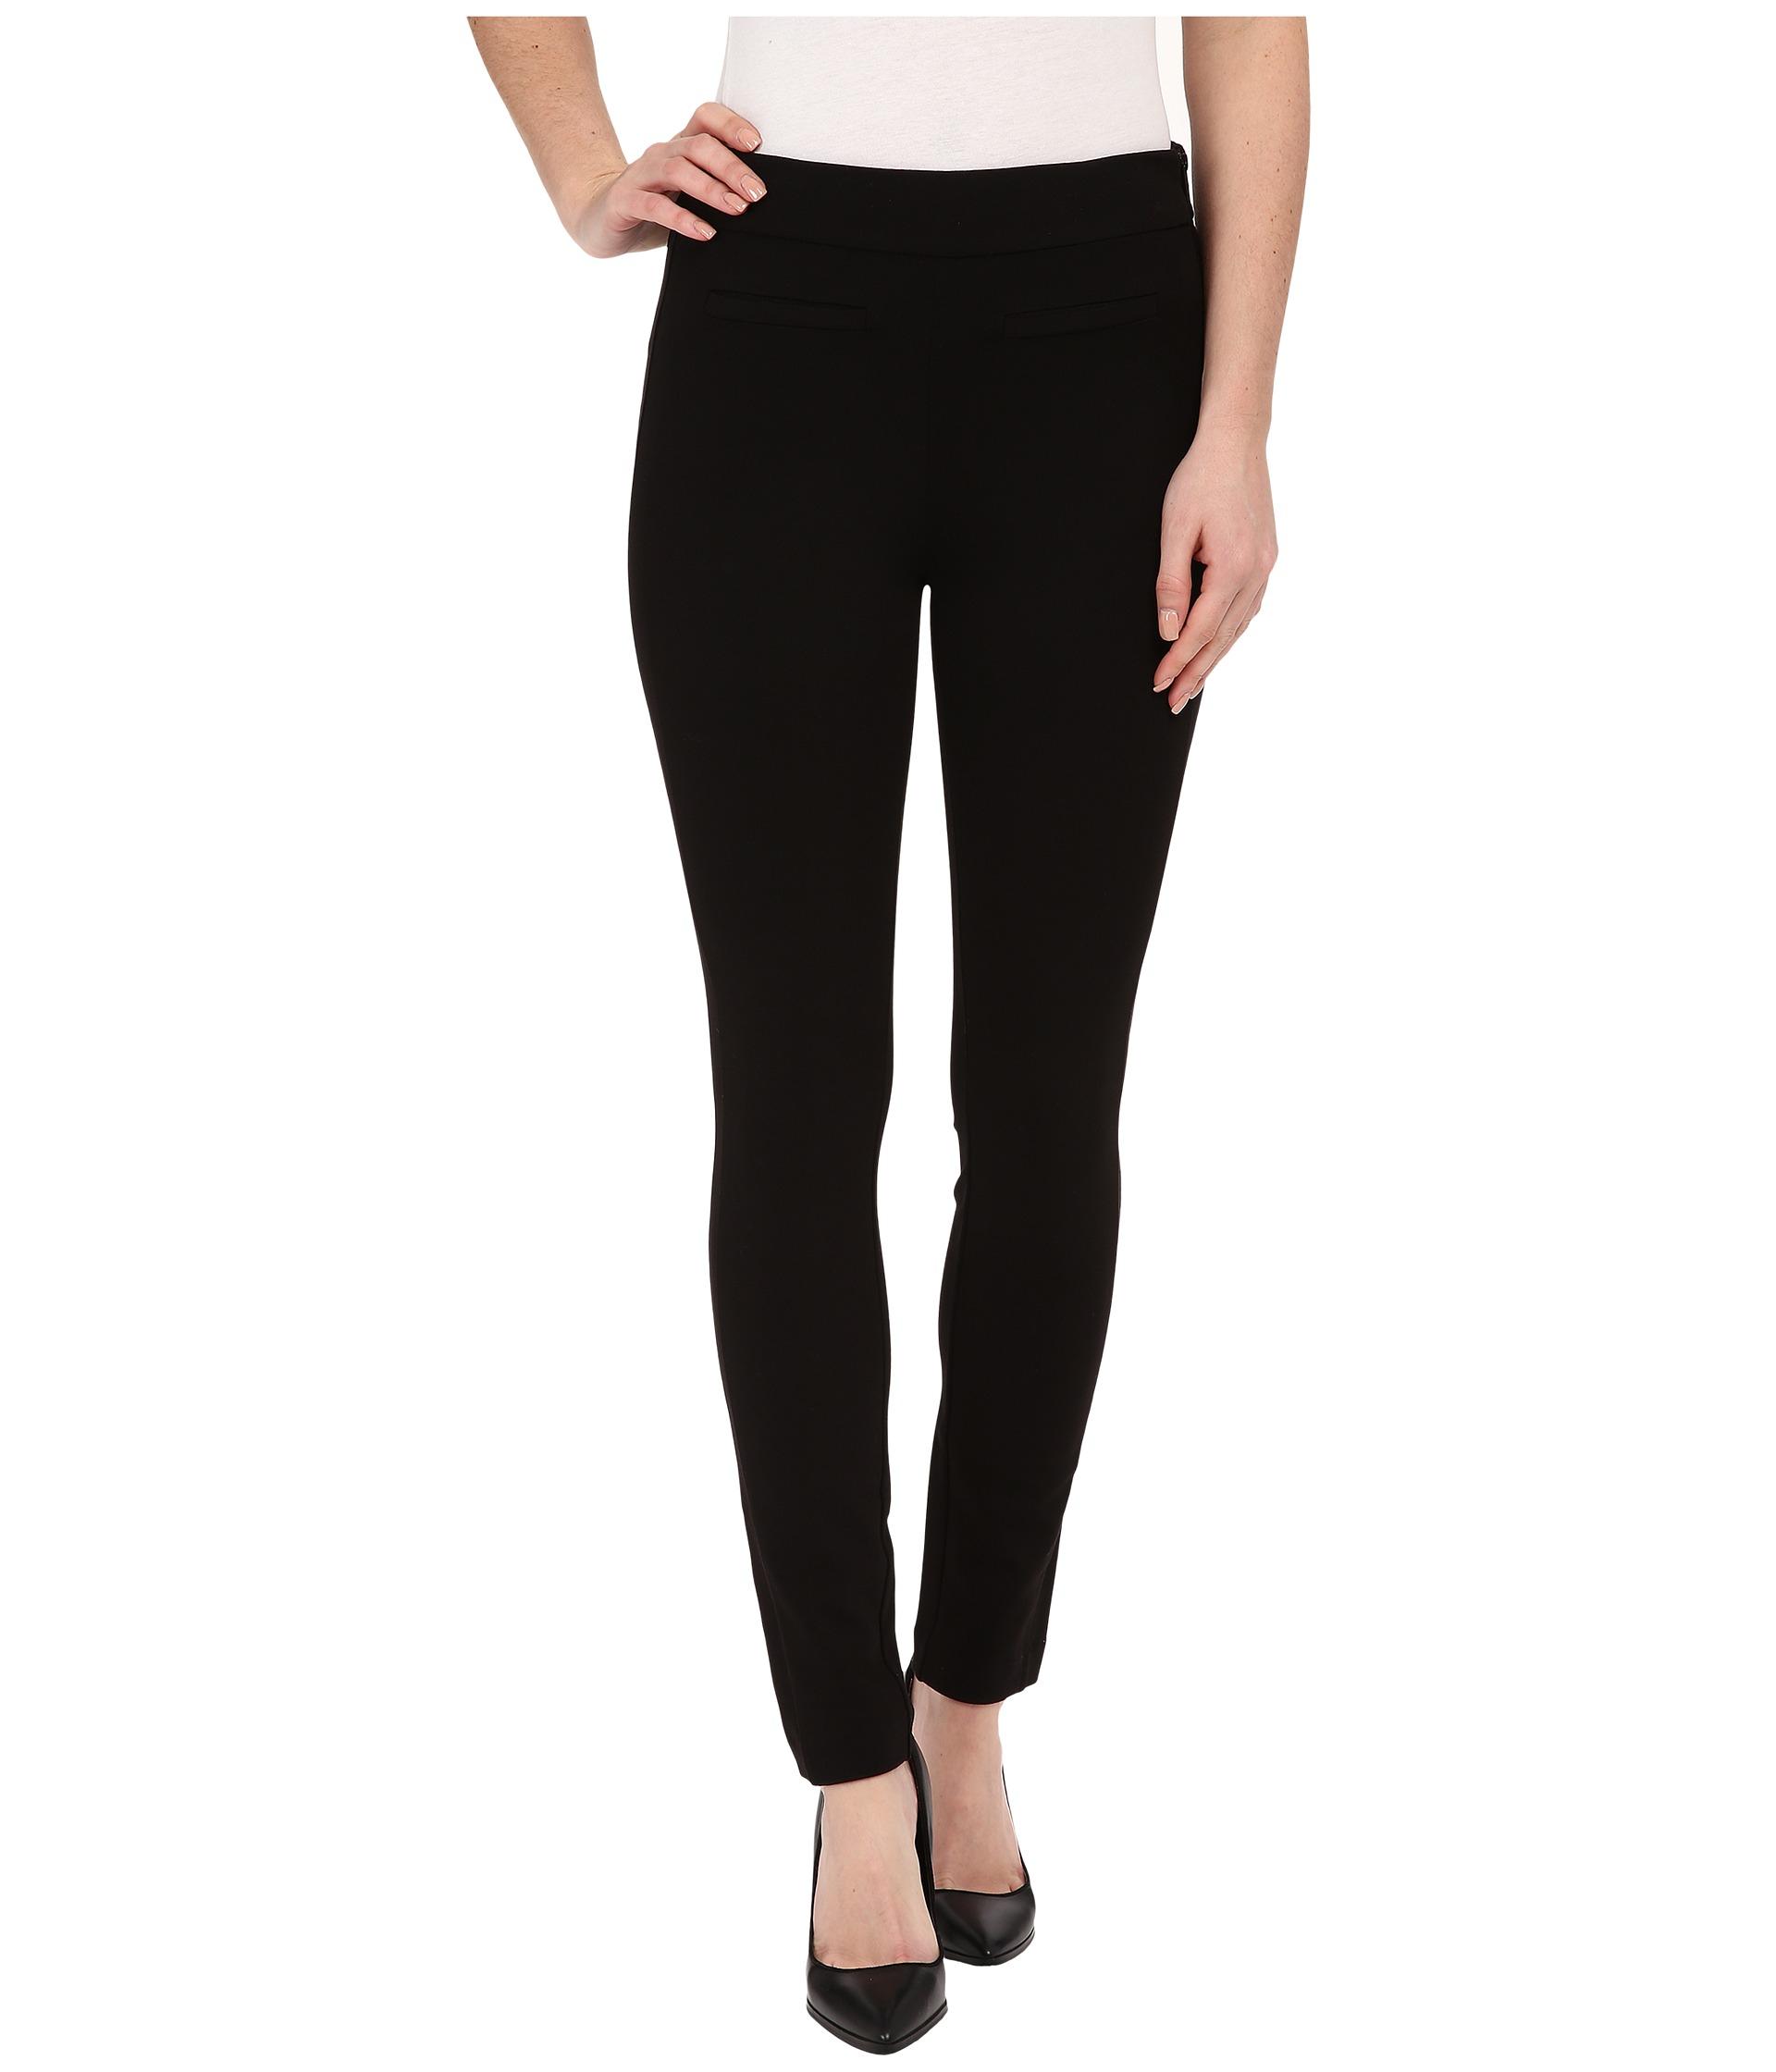 sanctuary-black-essential-tower-skinny-pants-product-2-053013955-normal.jpeg